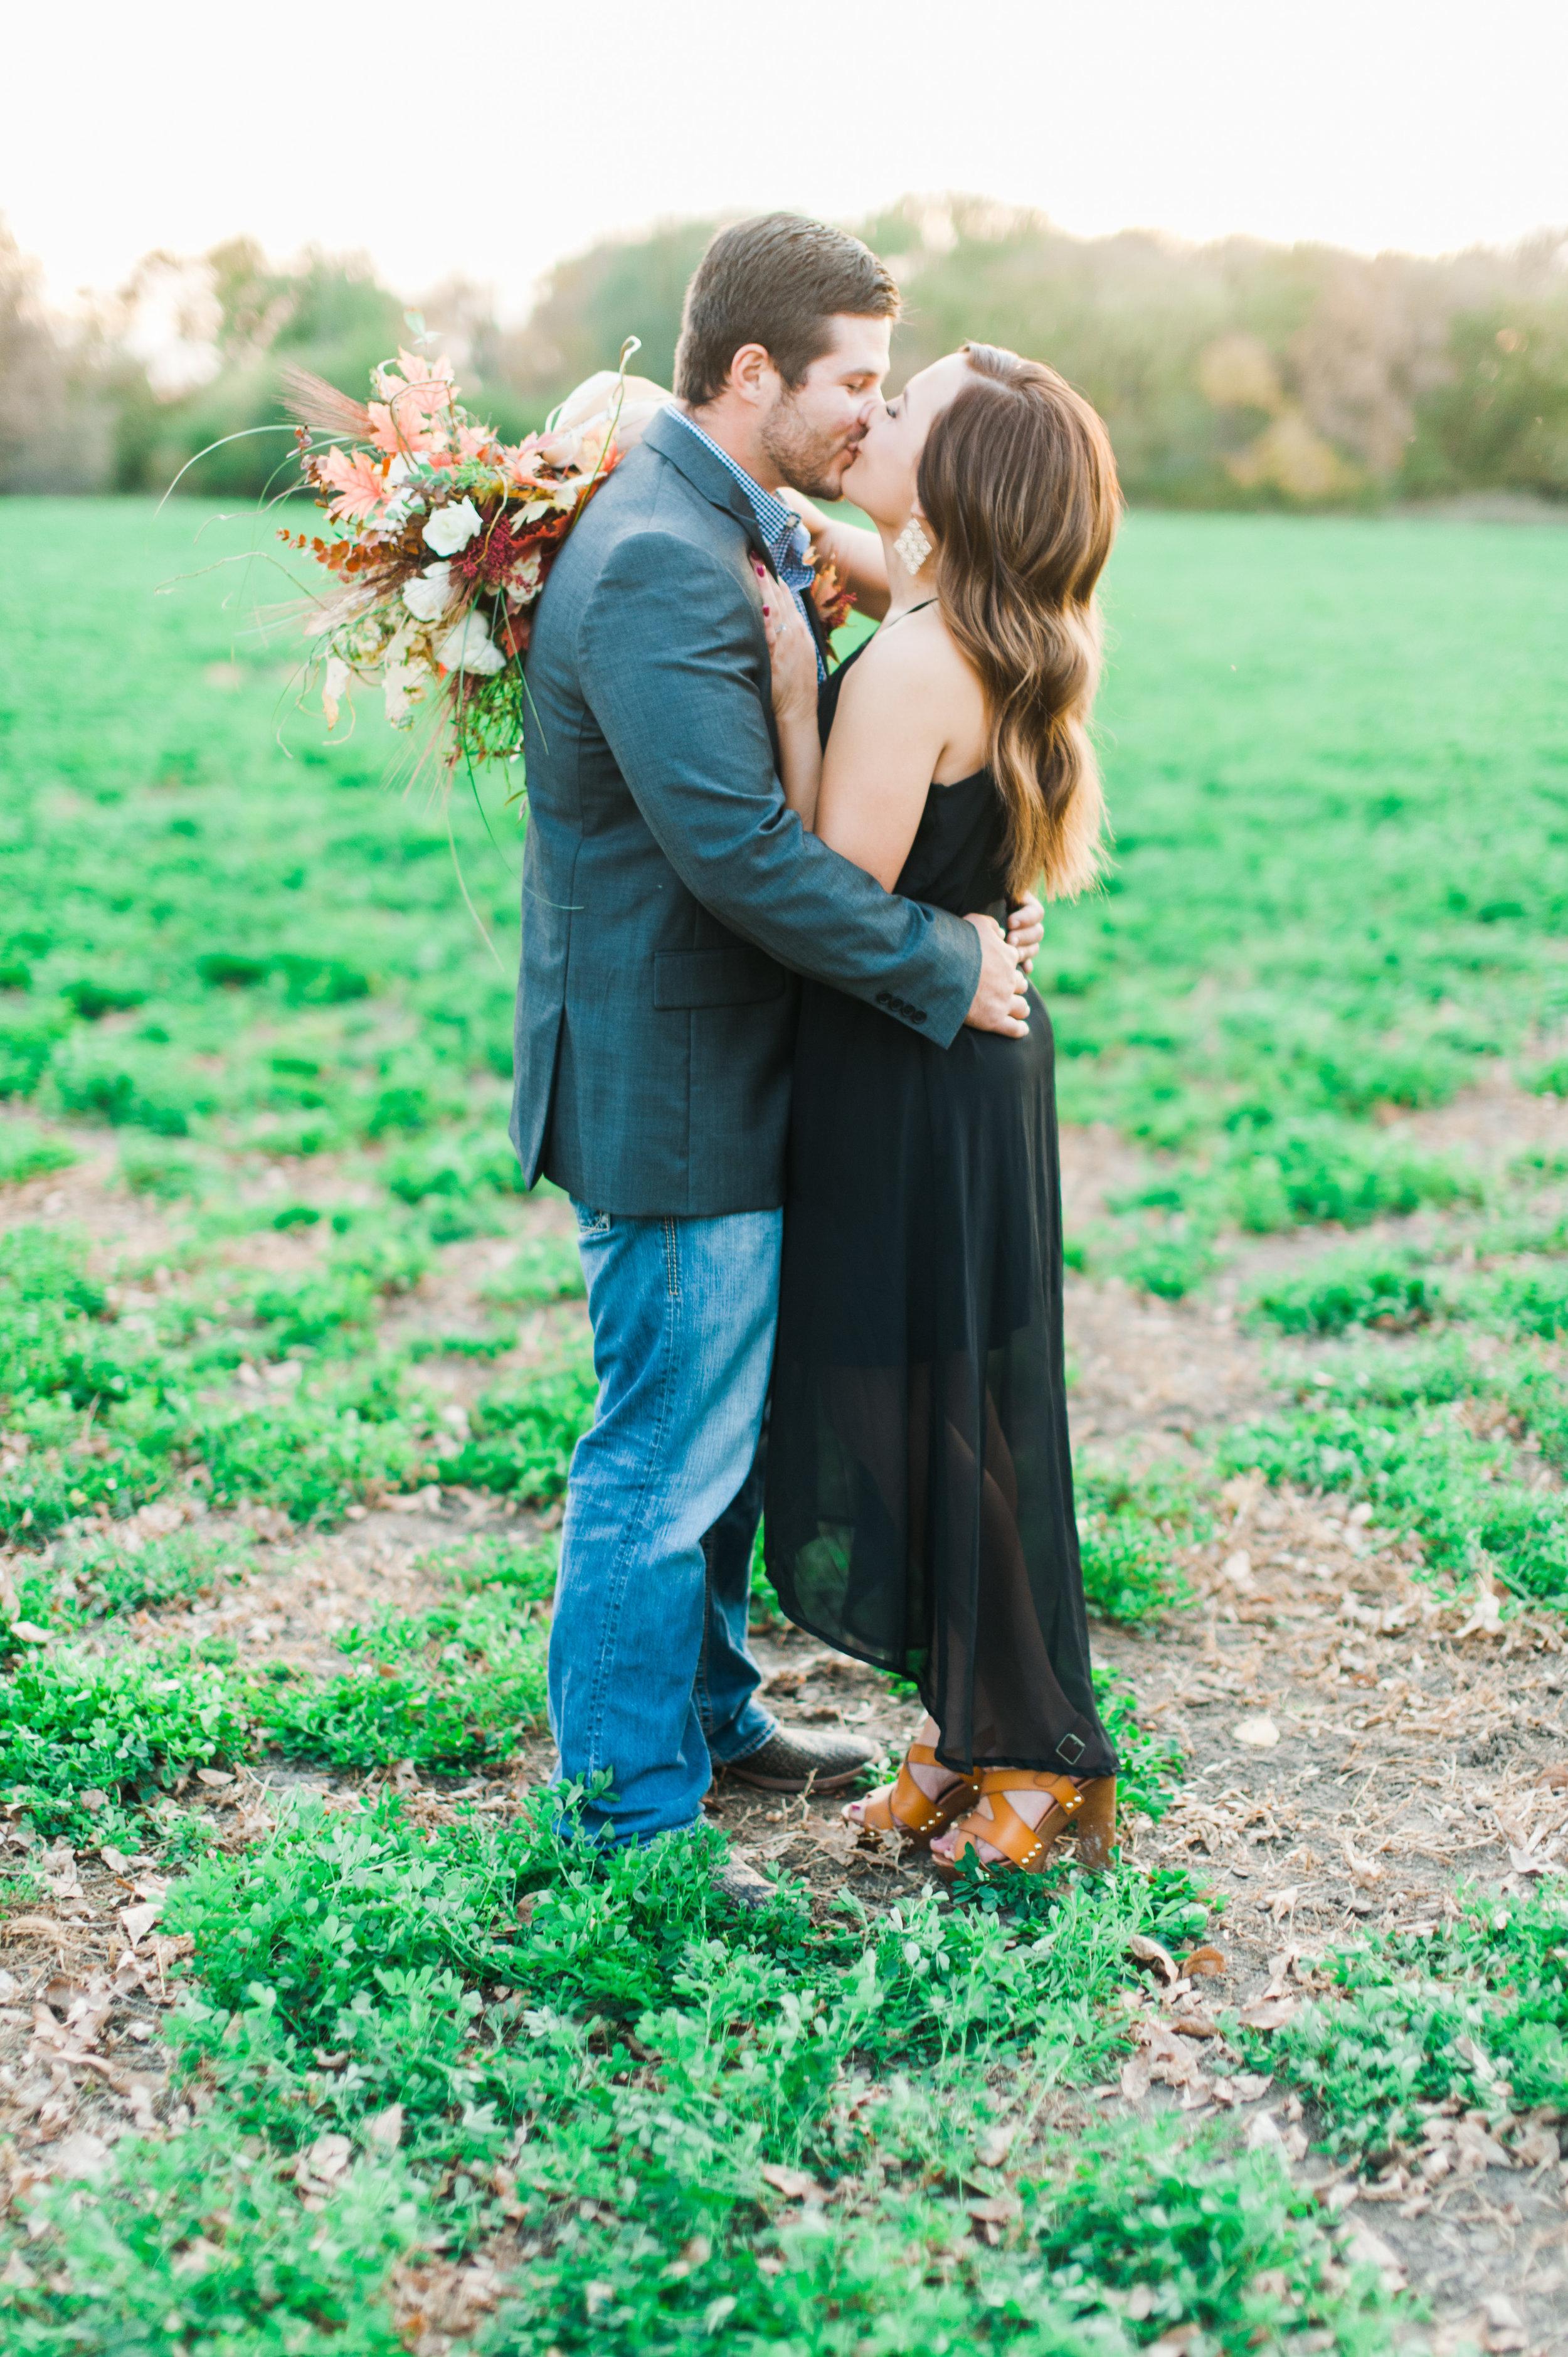 omaha-engagements-outdoor-fall-florists-24.jpg